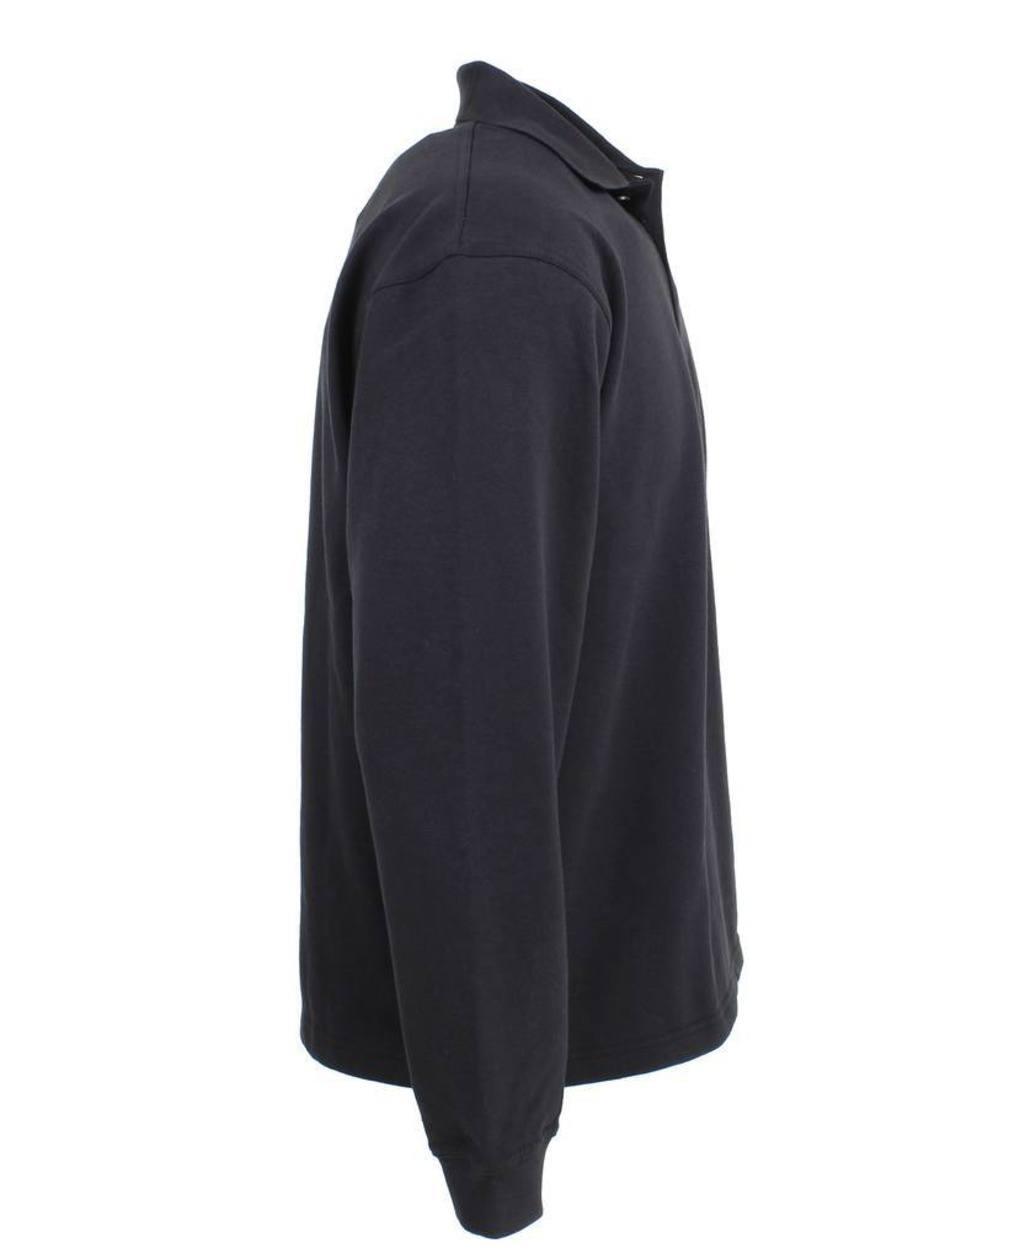 ERIK Polosweater